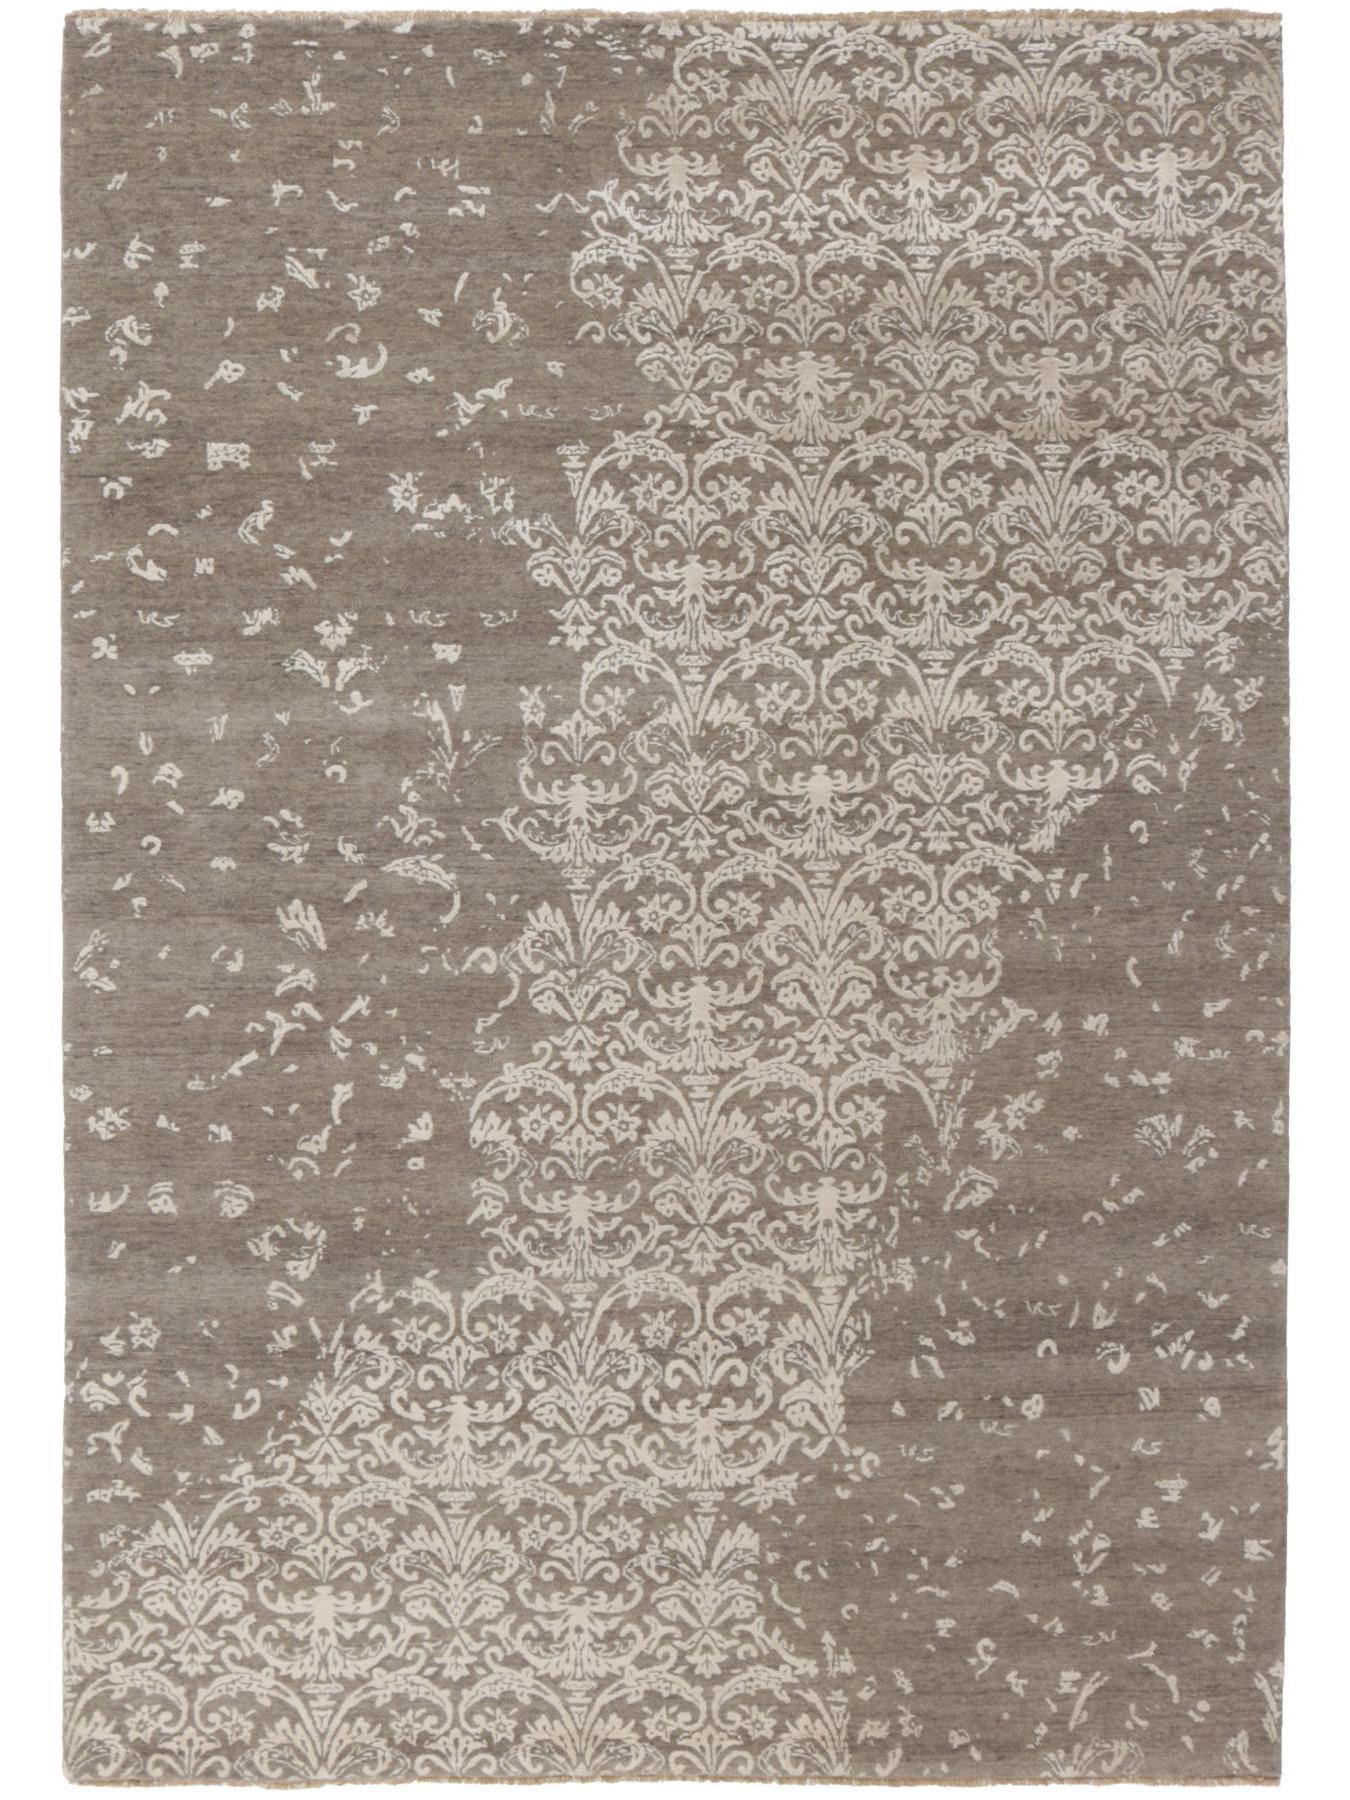 Luxury carpets - Damask-AL-2E F-34/B-34